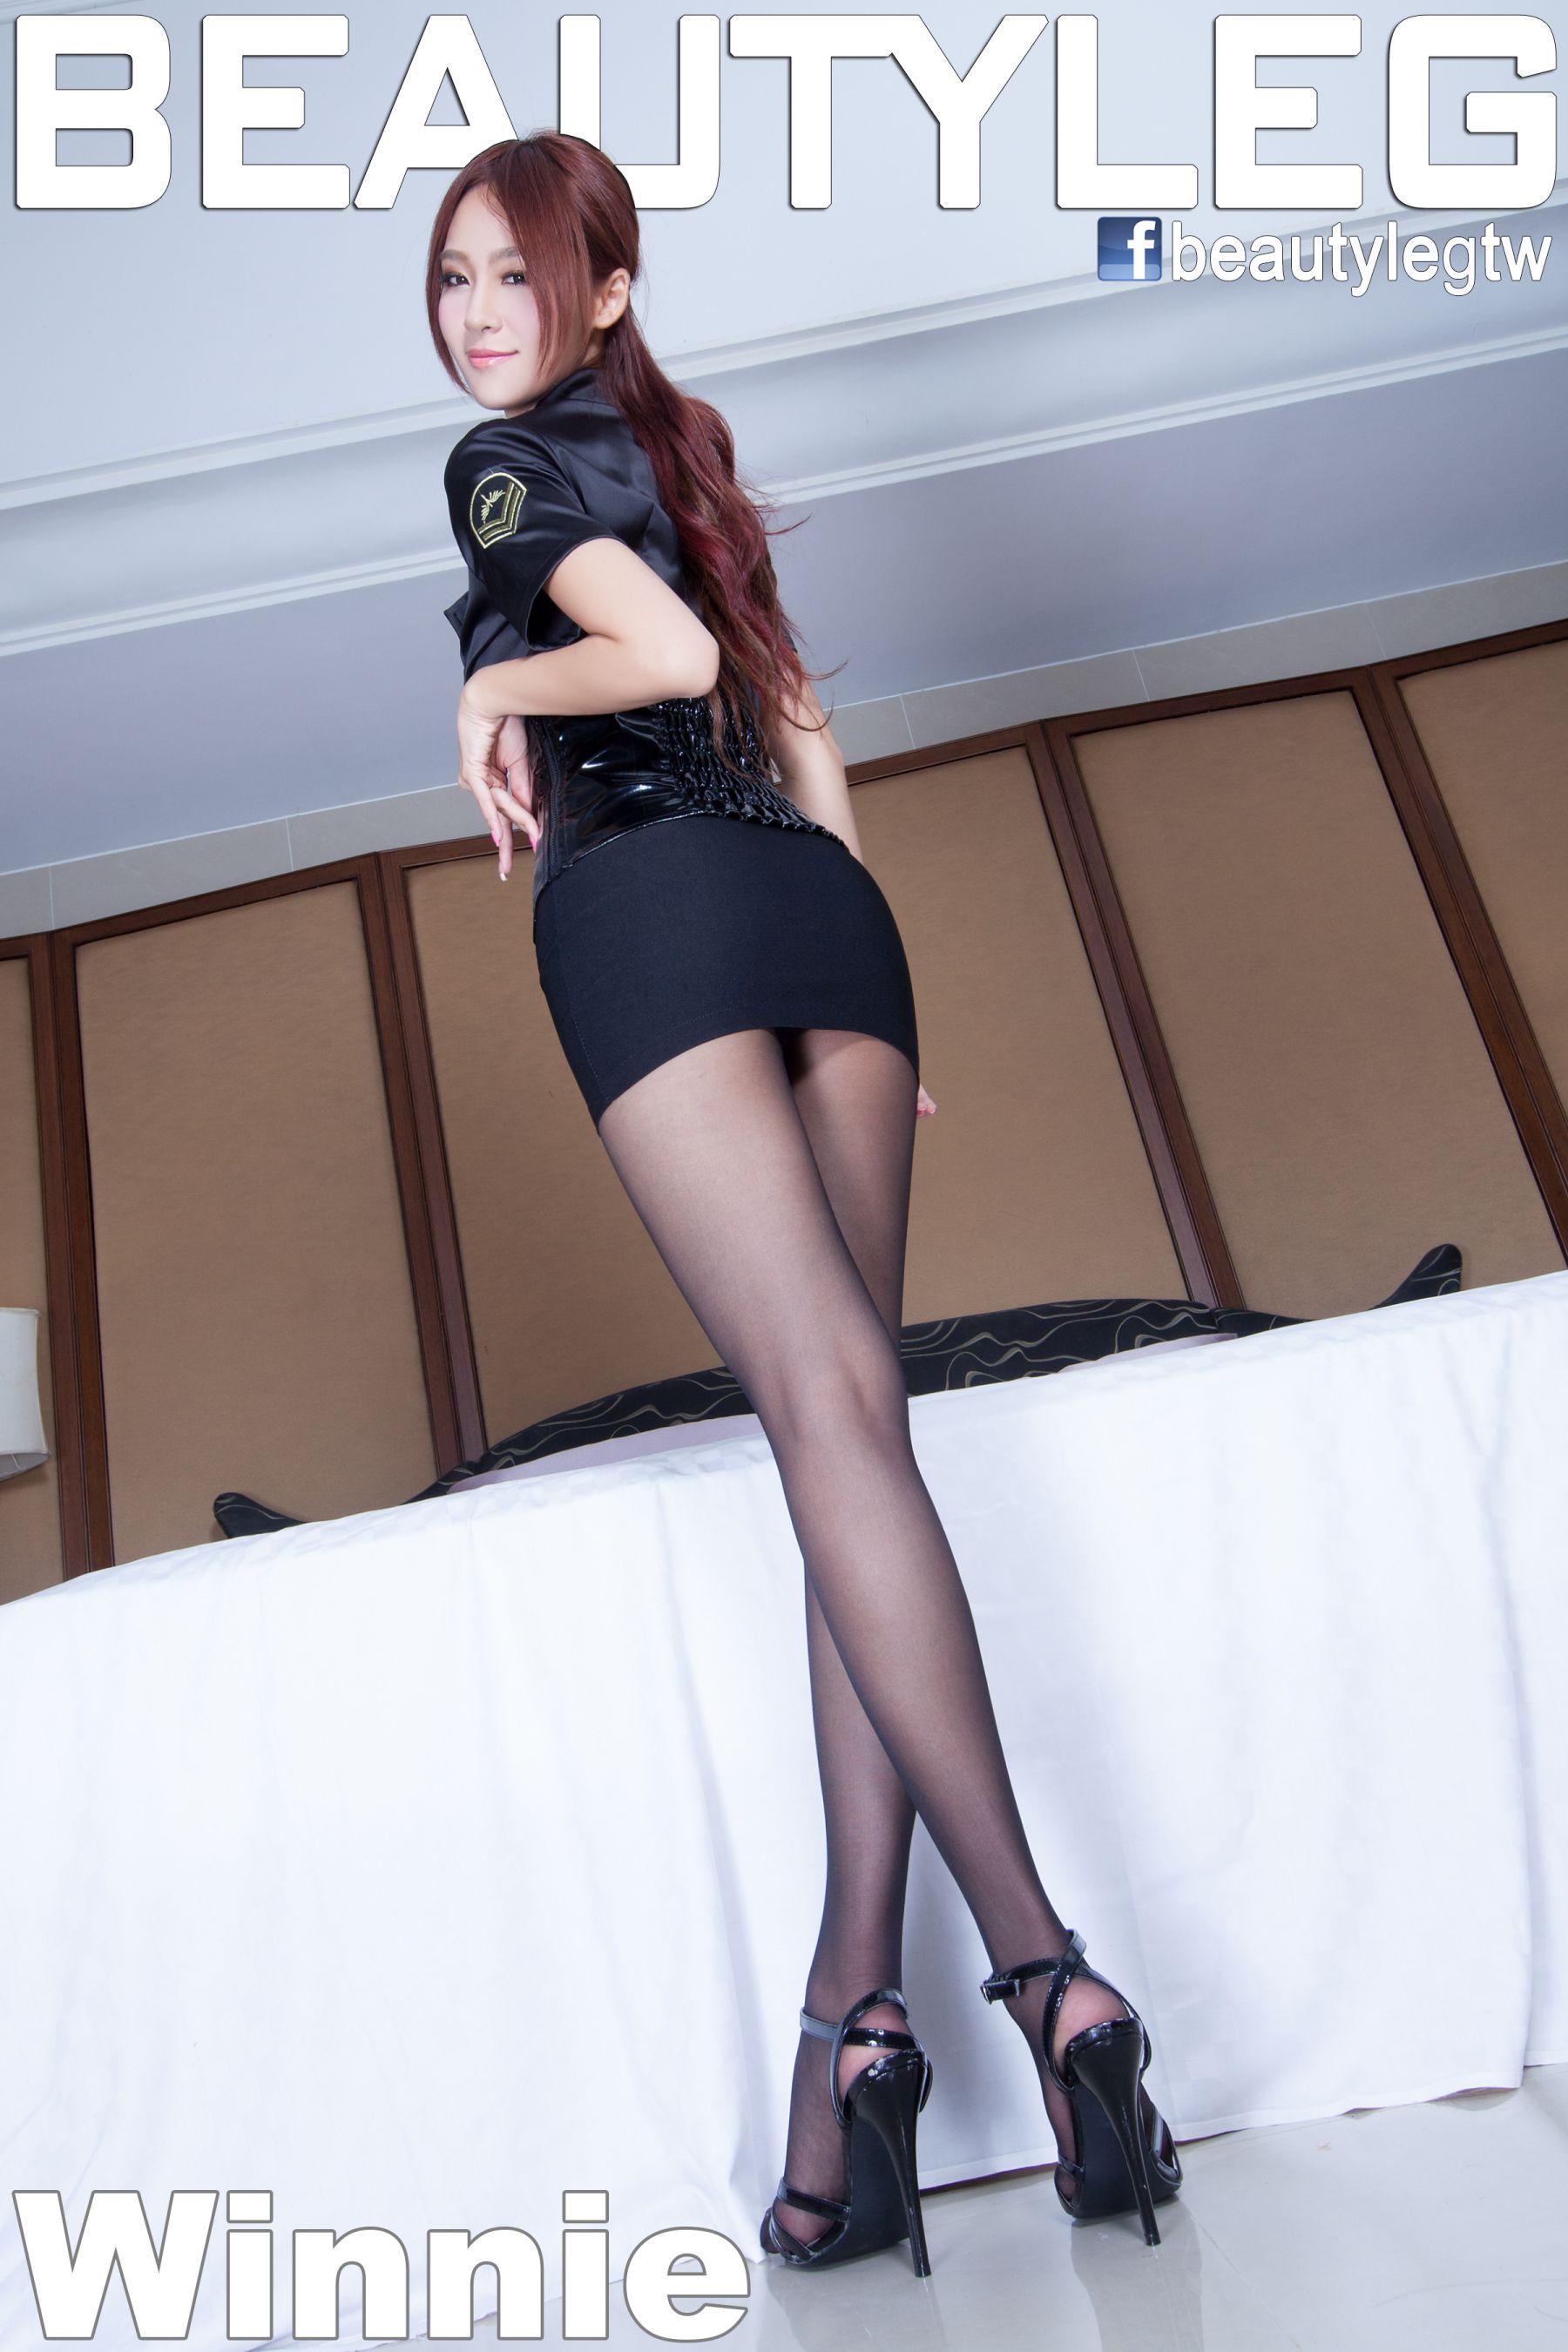 VOL.962 [Beautyleg]超短裙美腿高跟:Winnie小雪(庄咏惠,庄温妮,腿模Winnie)高品质写真套图(74P)